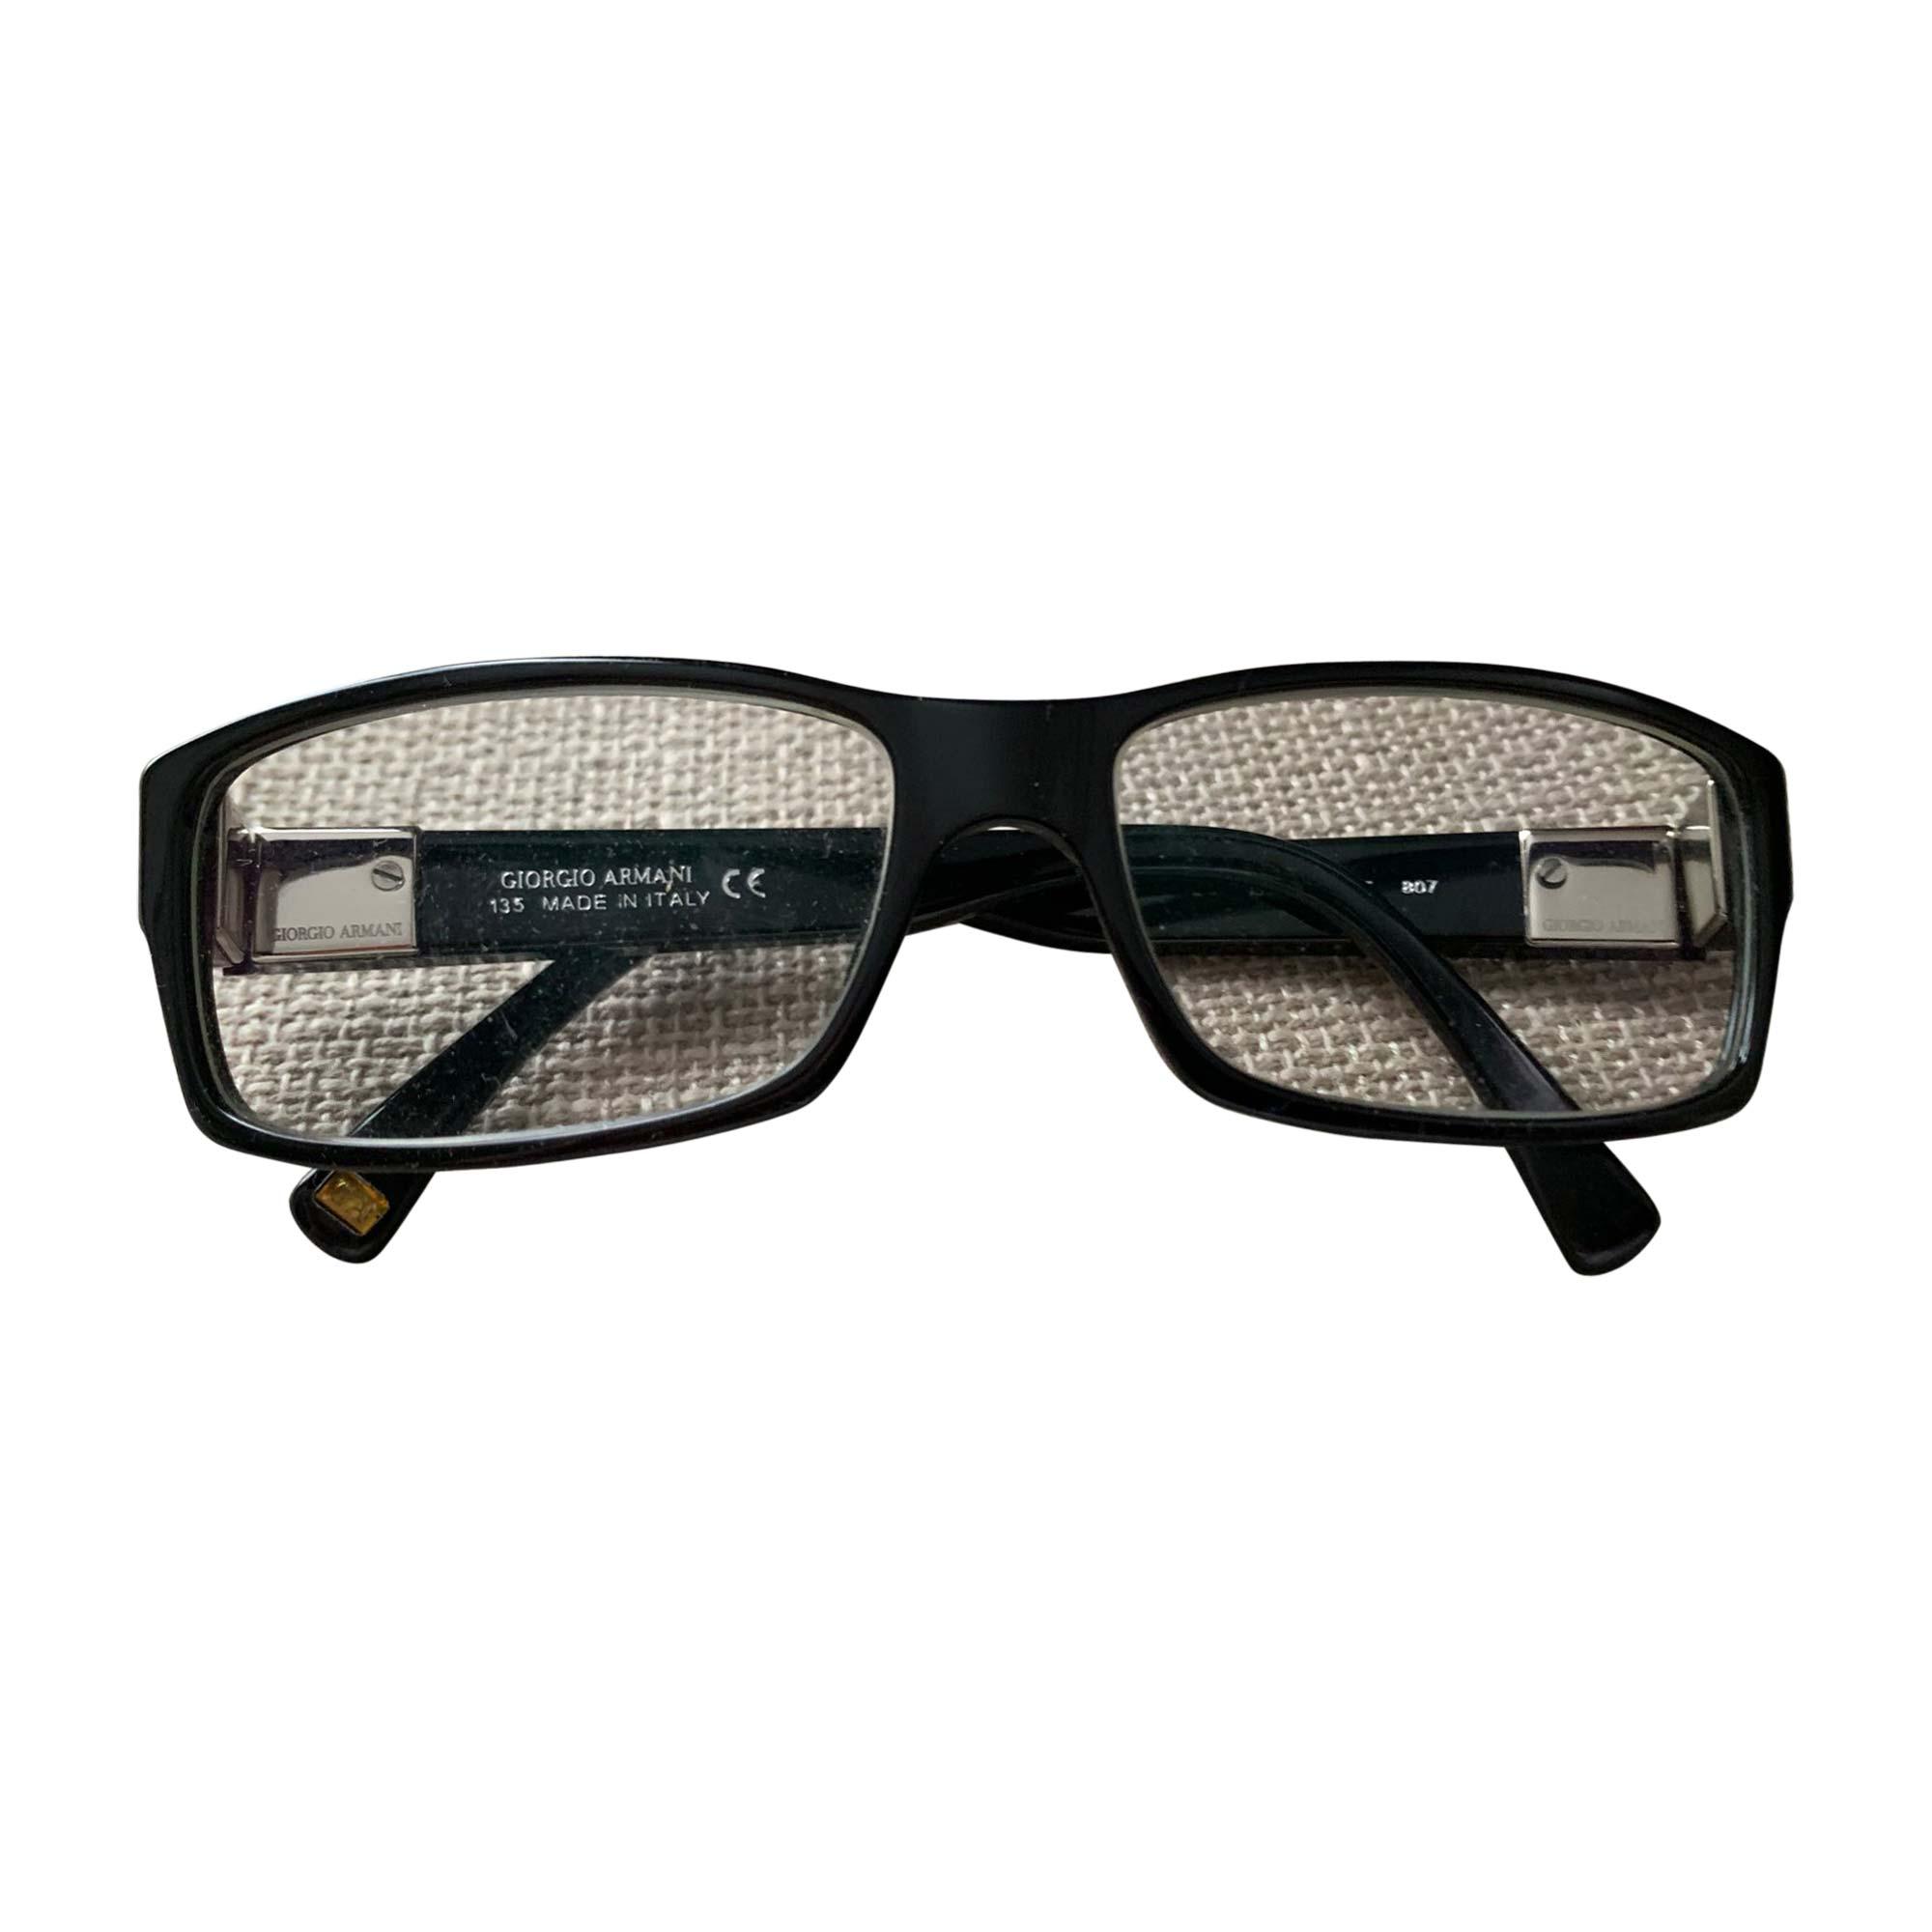 Eyeglass Frames GIORGIO ARMANI Black